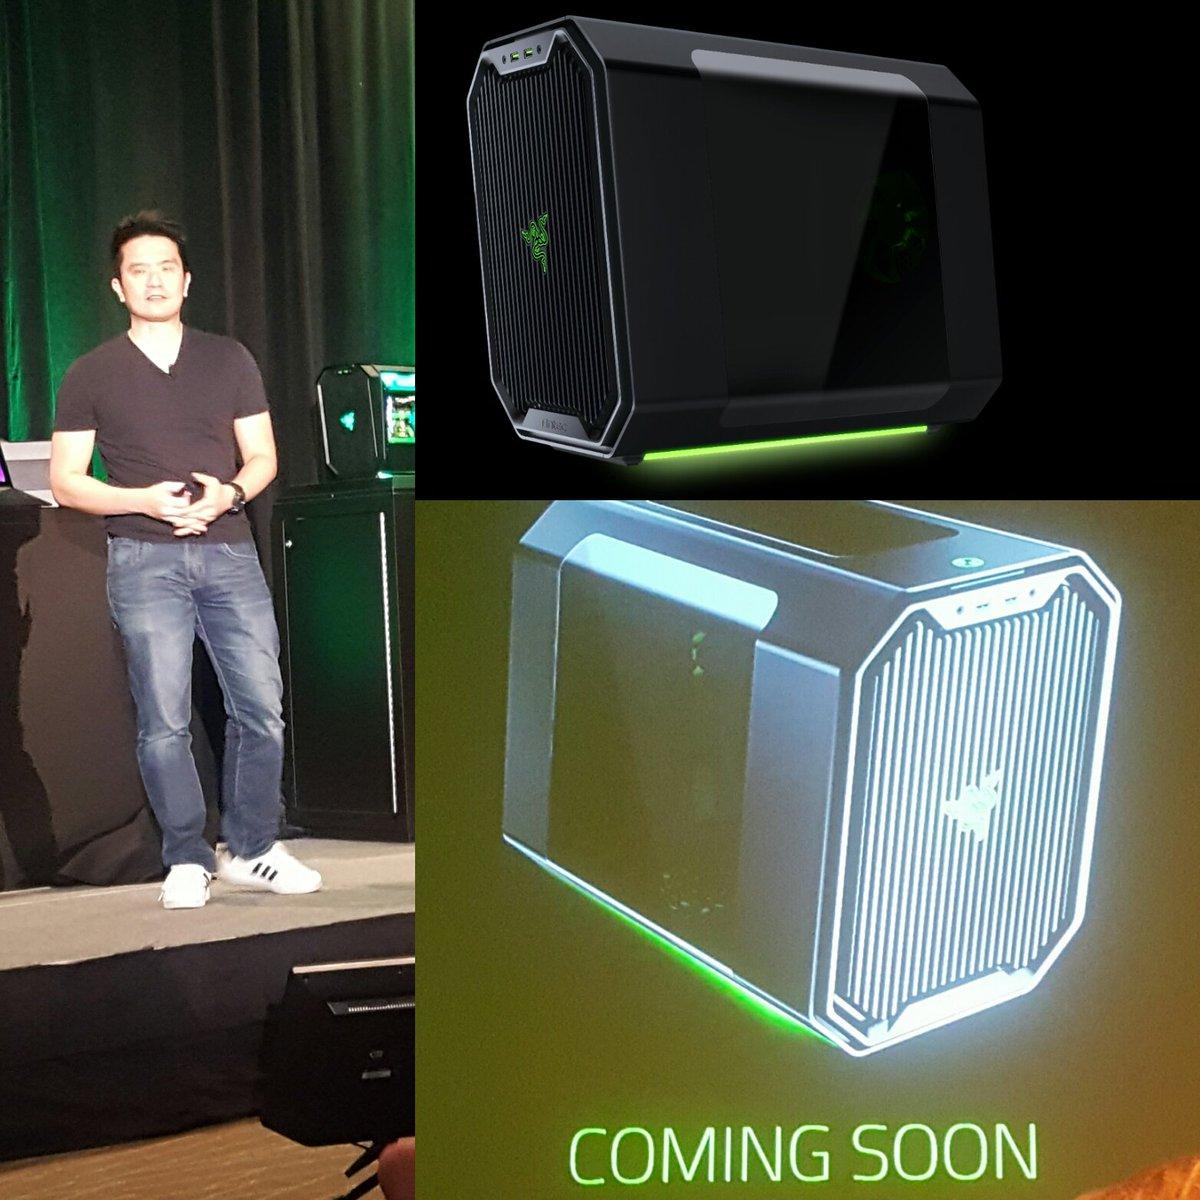 @minliangtan unveils the Antec Cube-- Designed by Razer #antecPAX #razerPAX https://t.co/2xYOt1NhLS https://t.co/Jg1FfJcCx6